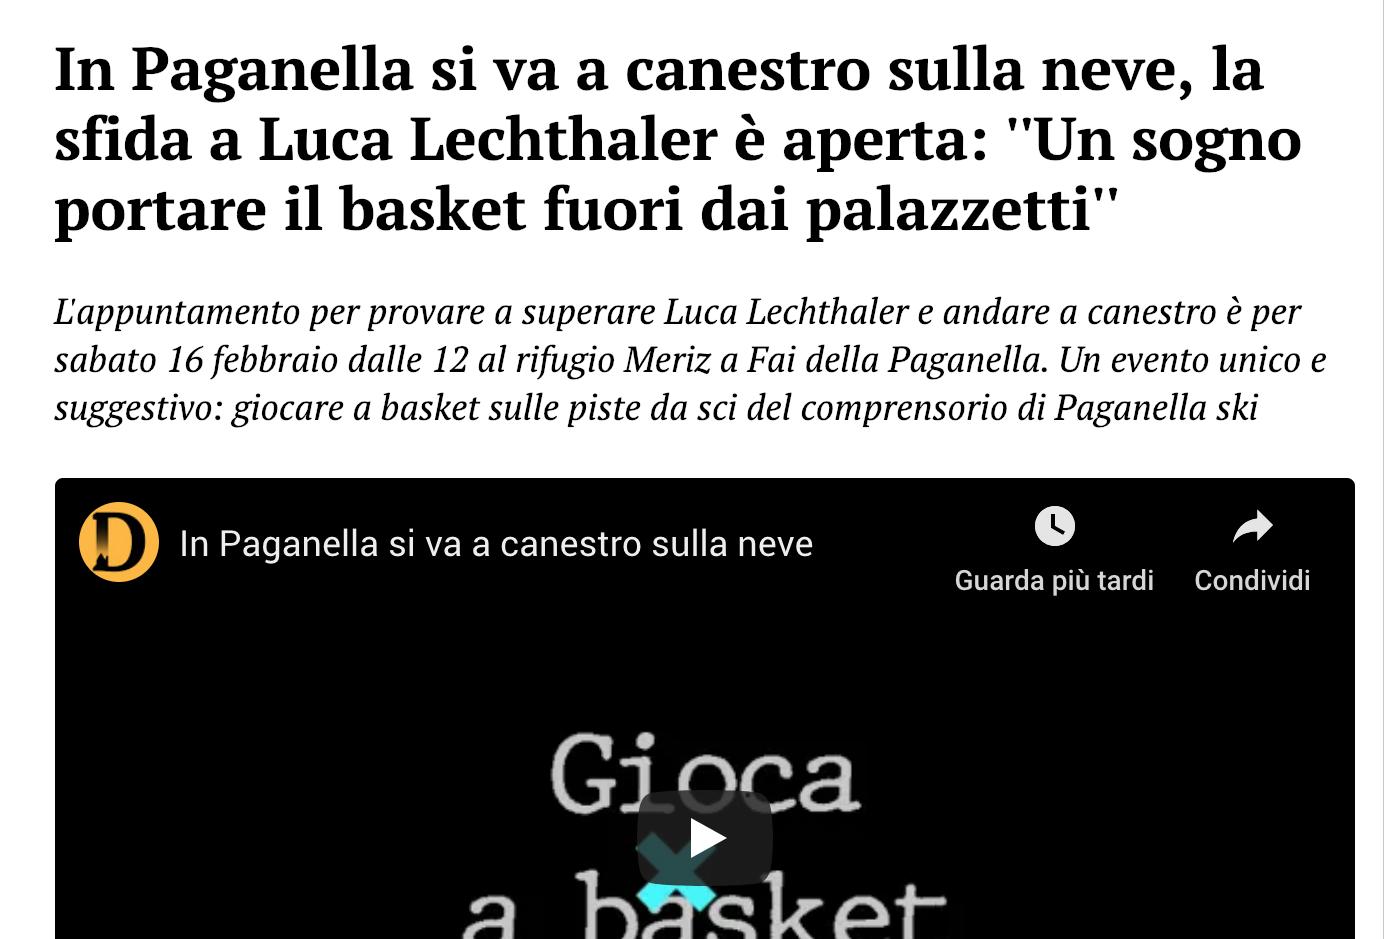 www.ildolomiti.it